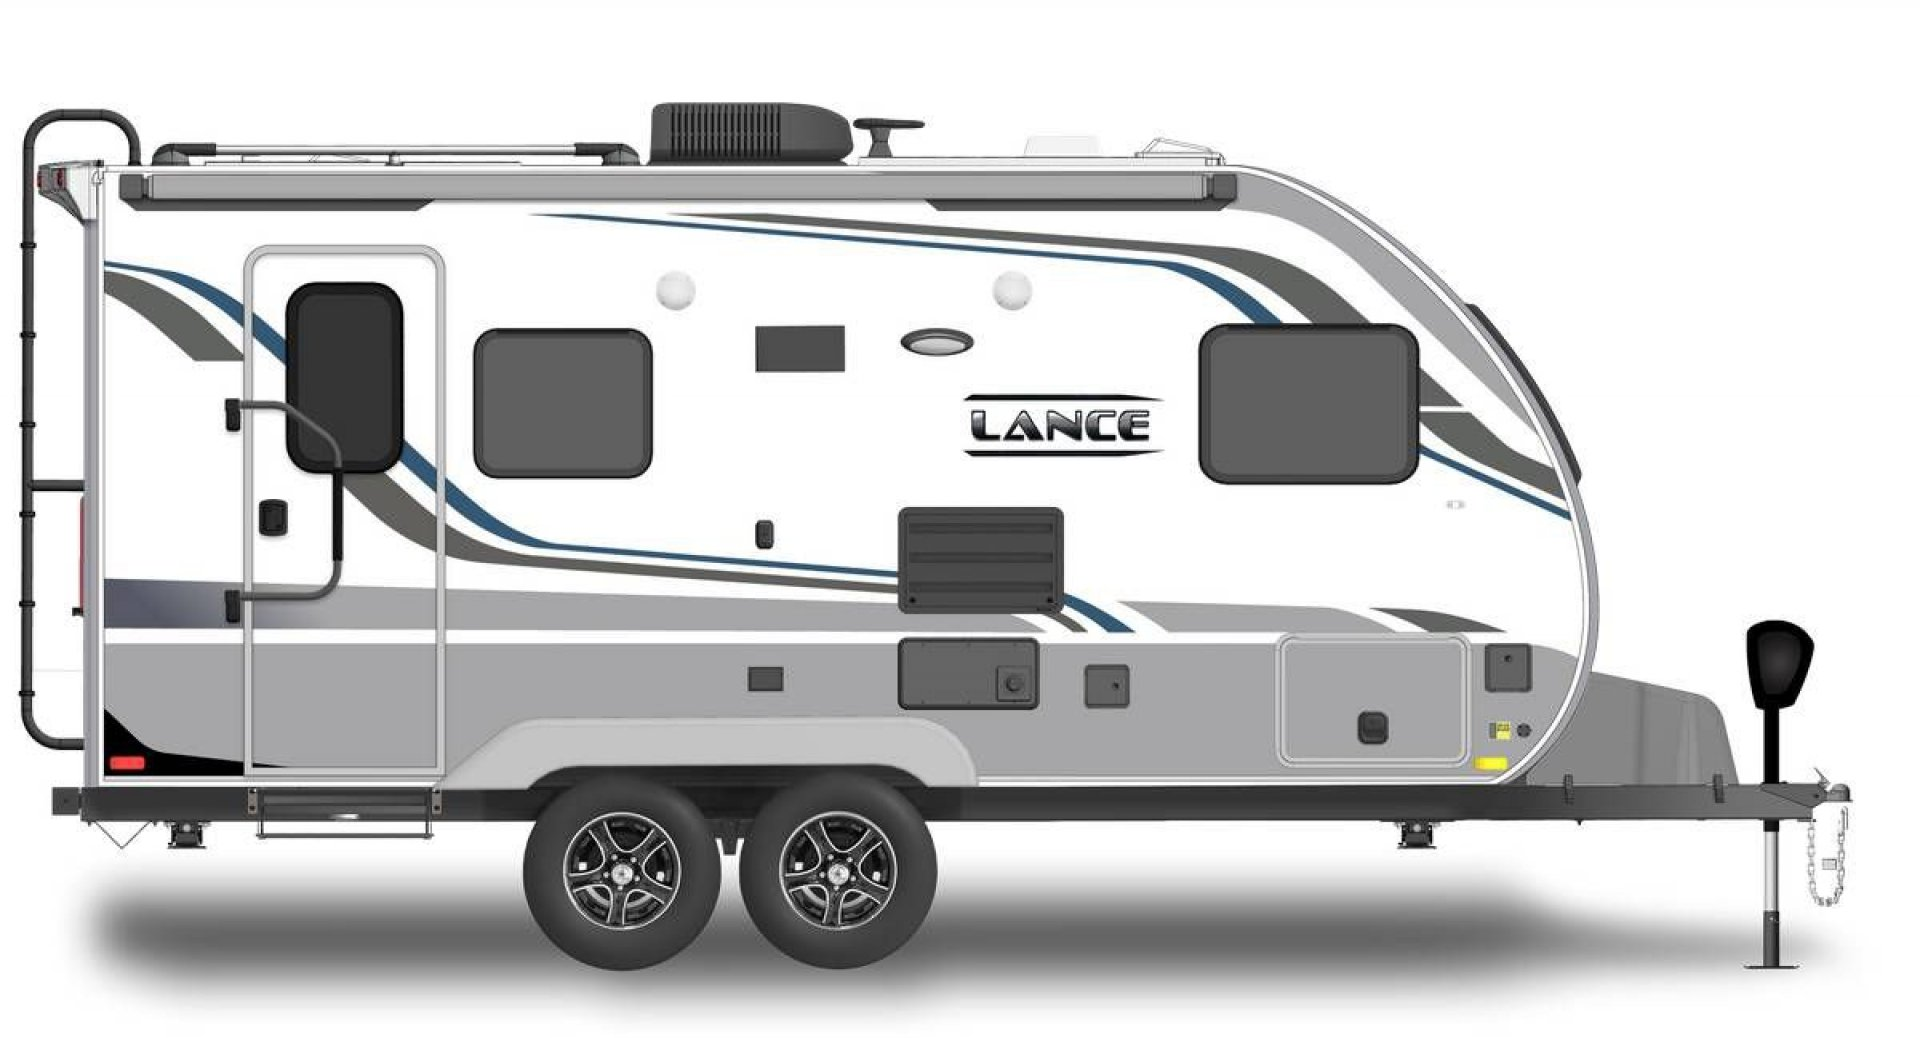 2021 LANCE LANCE 1685 - Airstreams | Campers London ...